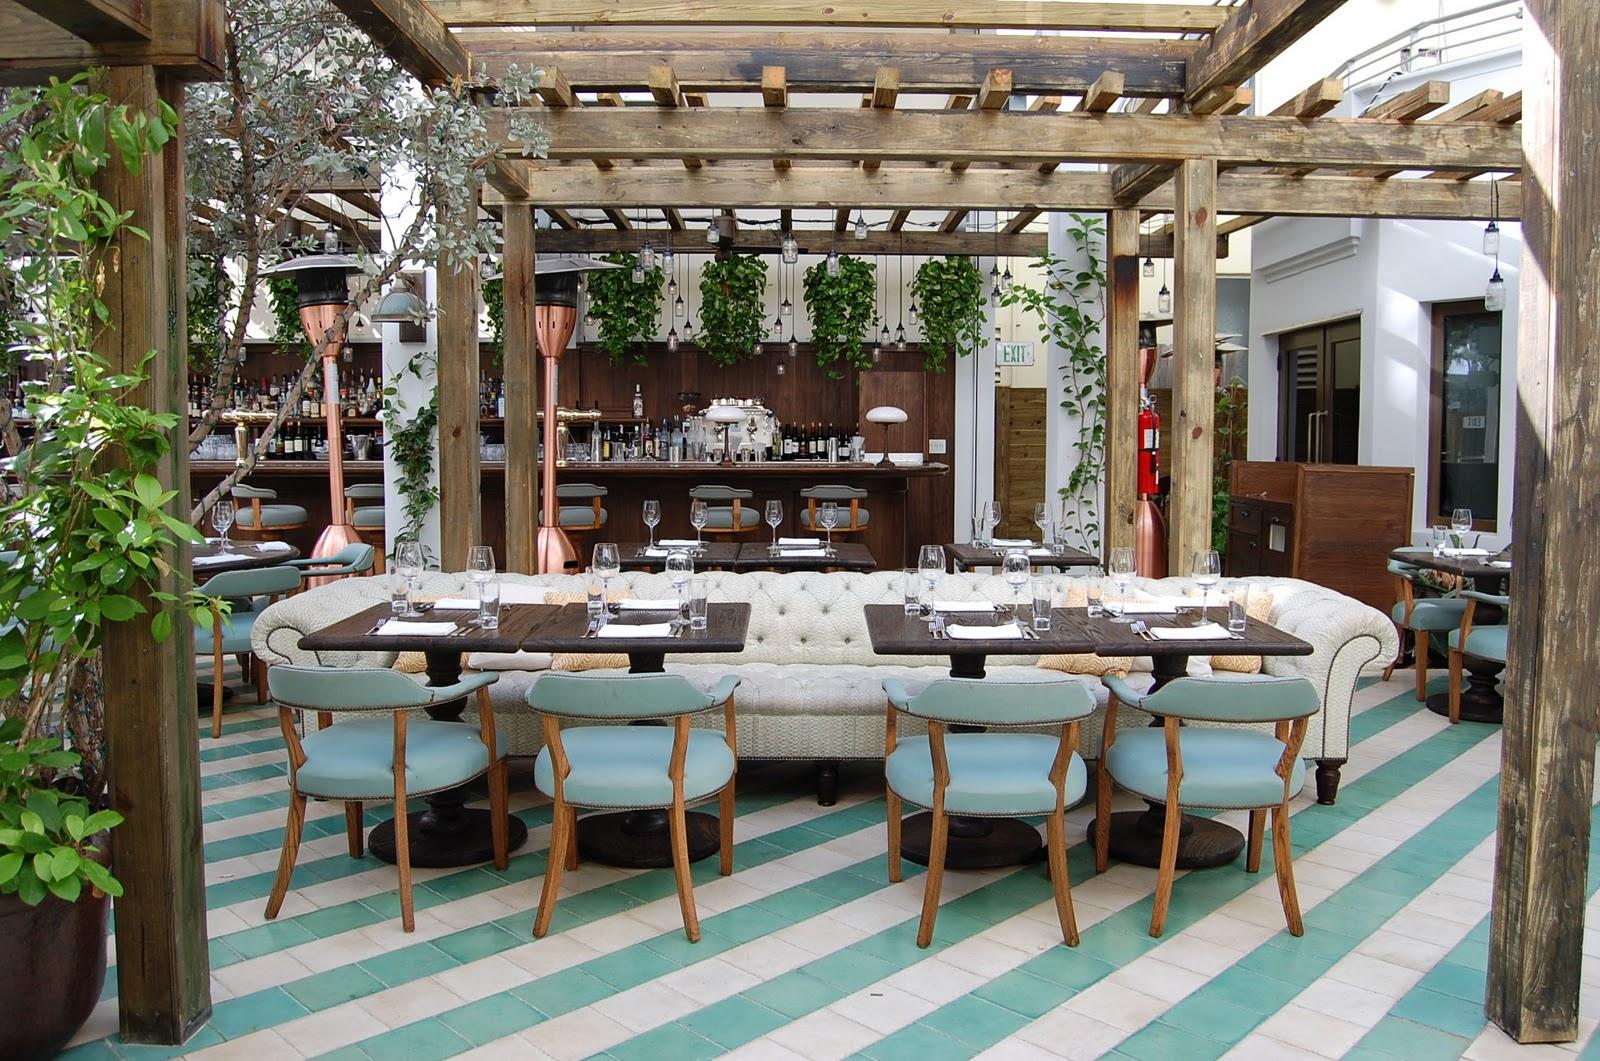 cecconis-soho-beach-house-miami-restaurant4.jpg